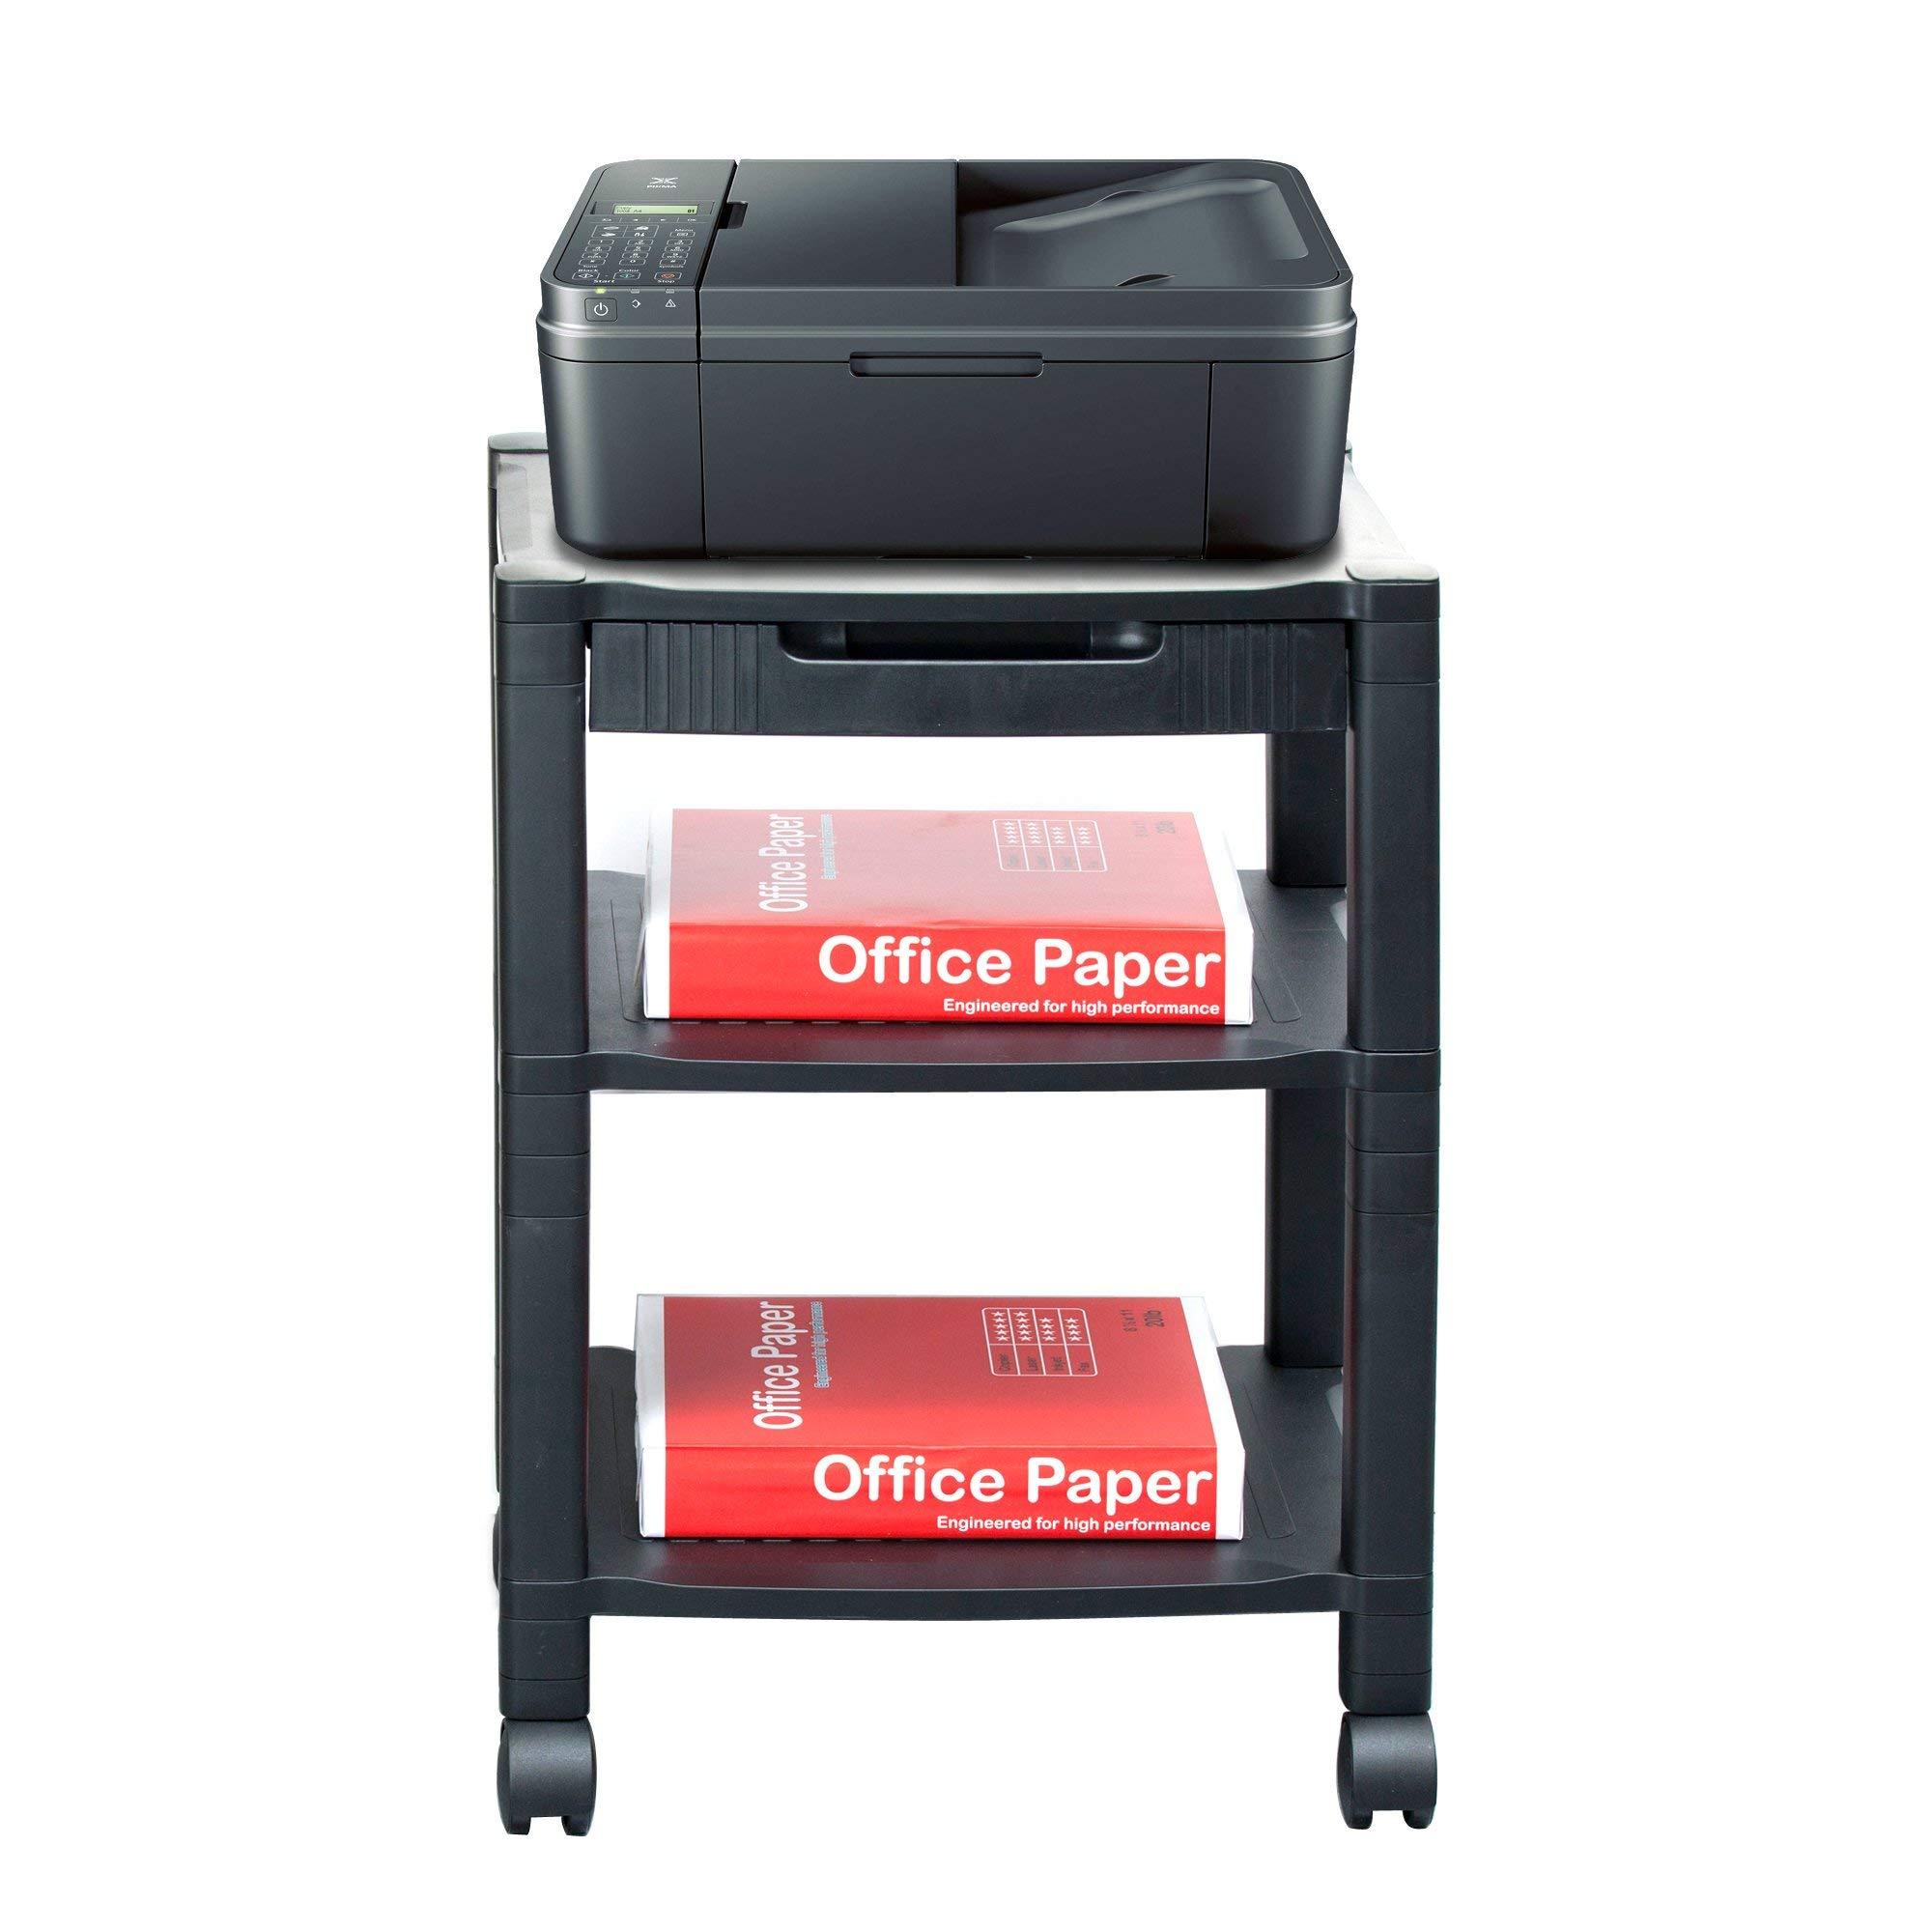 Mind Reader 3-Shelf Printer Cart, Stand with Wheels, Drawer, Cord Management, Black (Renewed) by Mind Reader